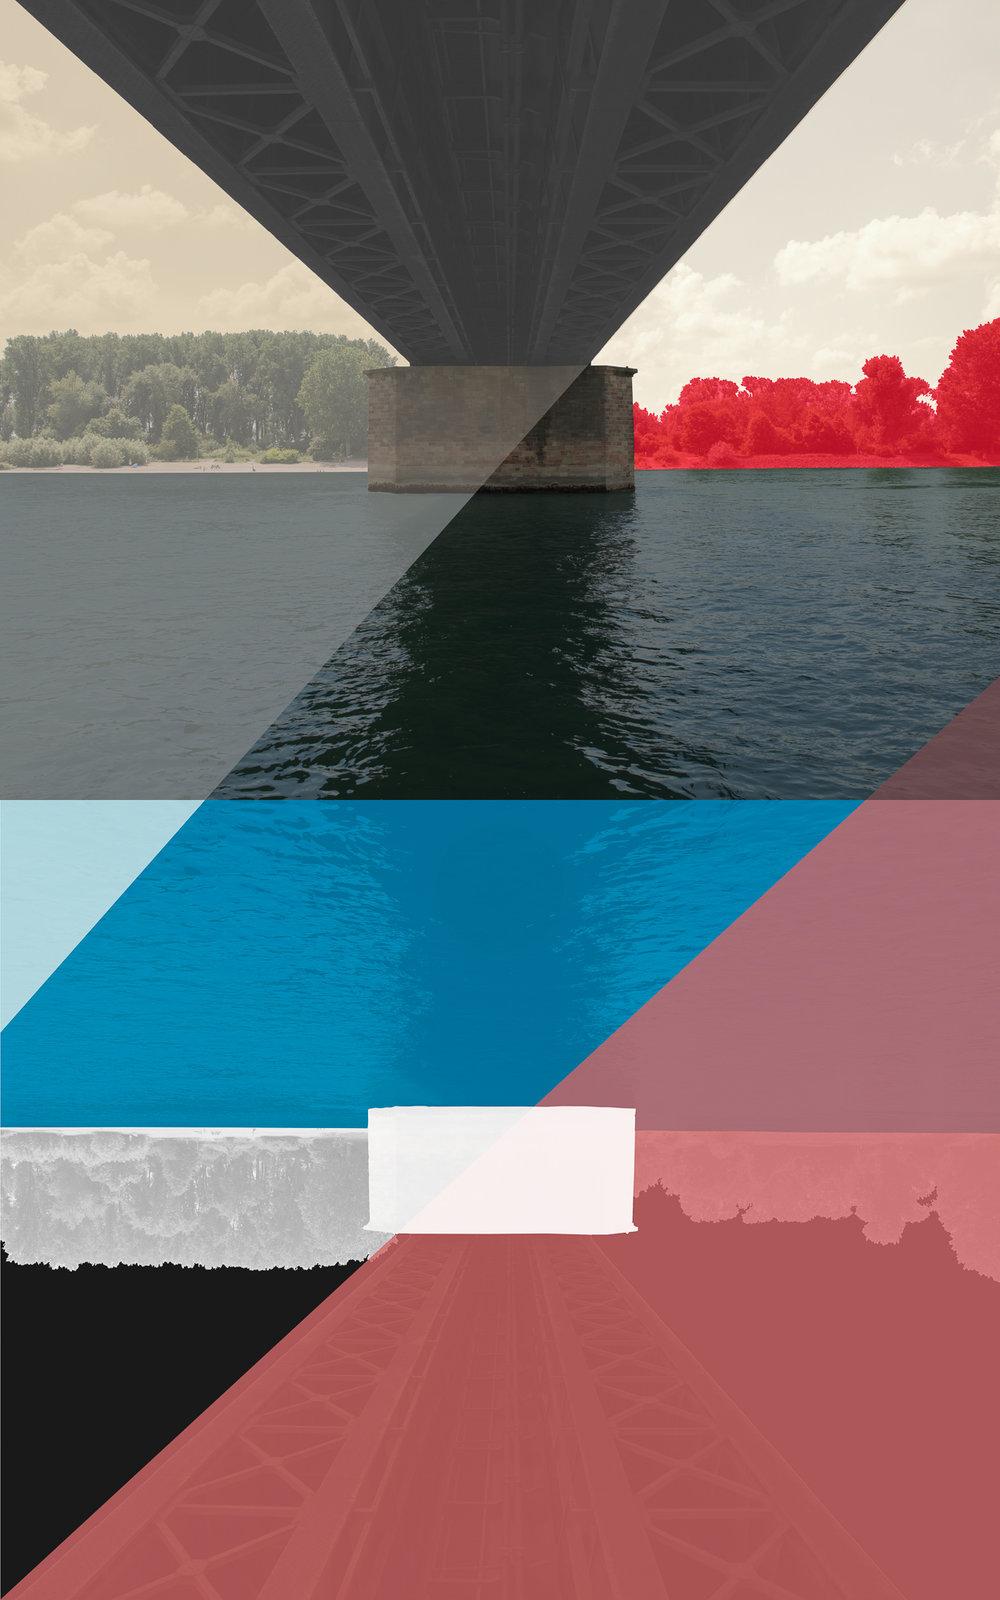 Jamie_Kripke_Down_the_Rhein_II-01.jpg